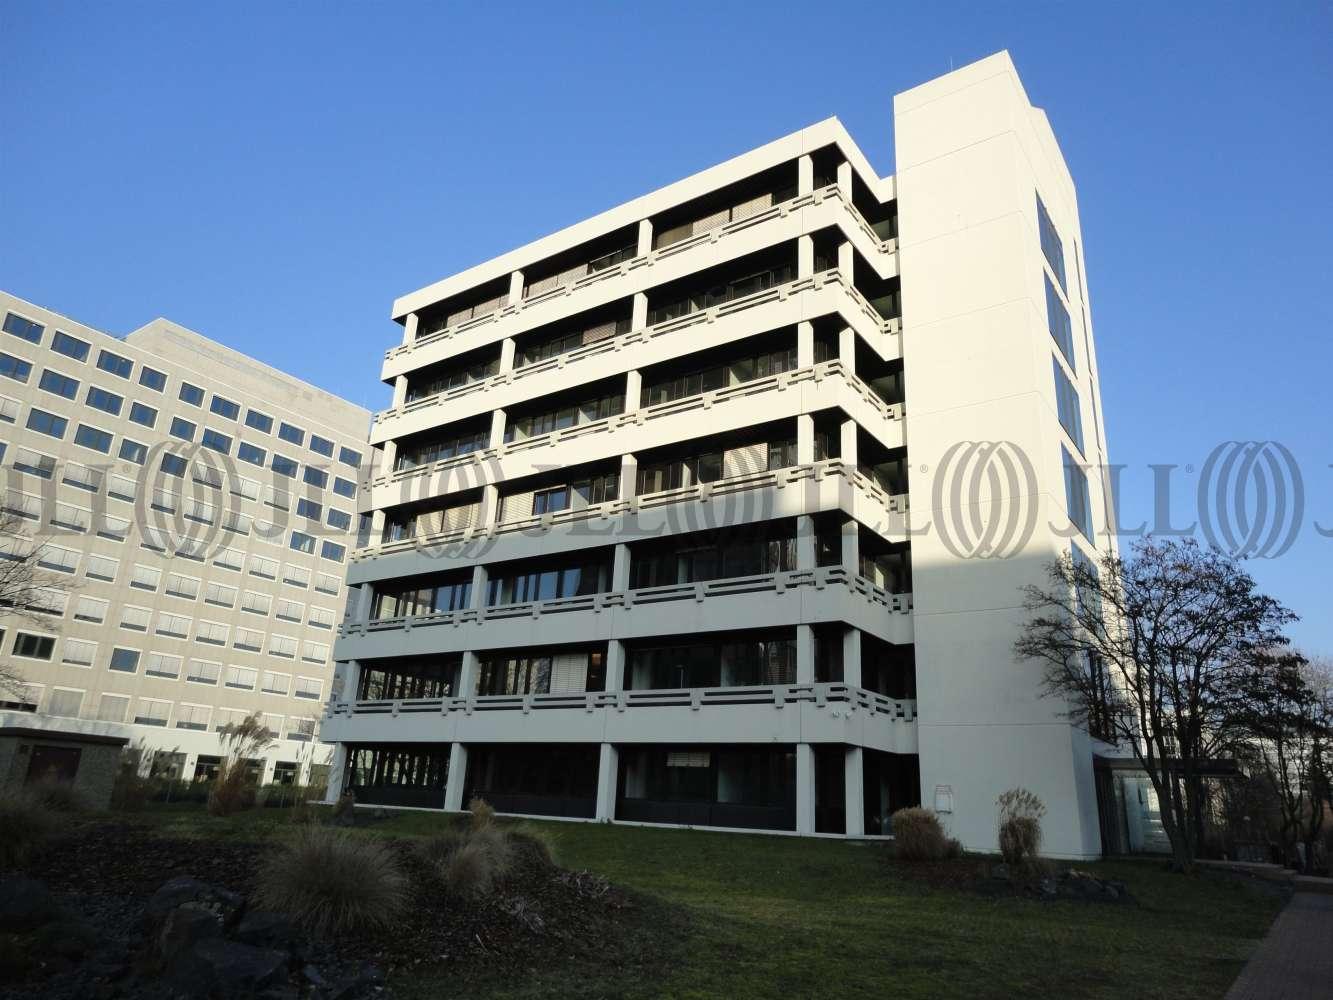 Büros Frankfurt am main, 60528 - Büro - Frankfurt am Main, Schwanheim - F1593 - 10043855